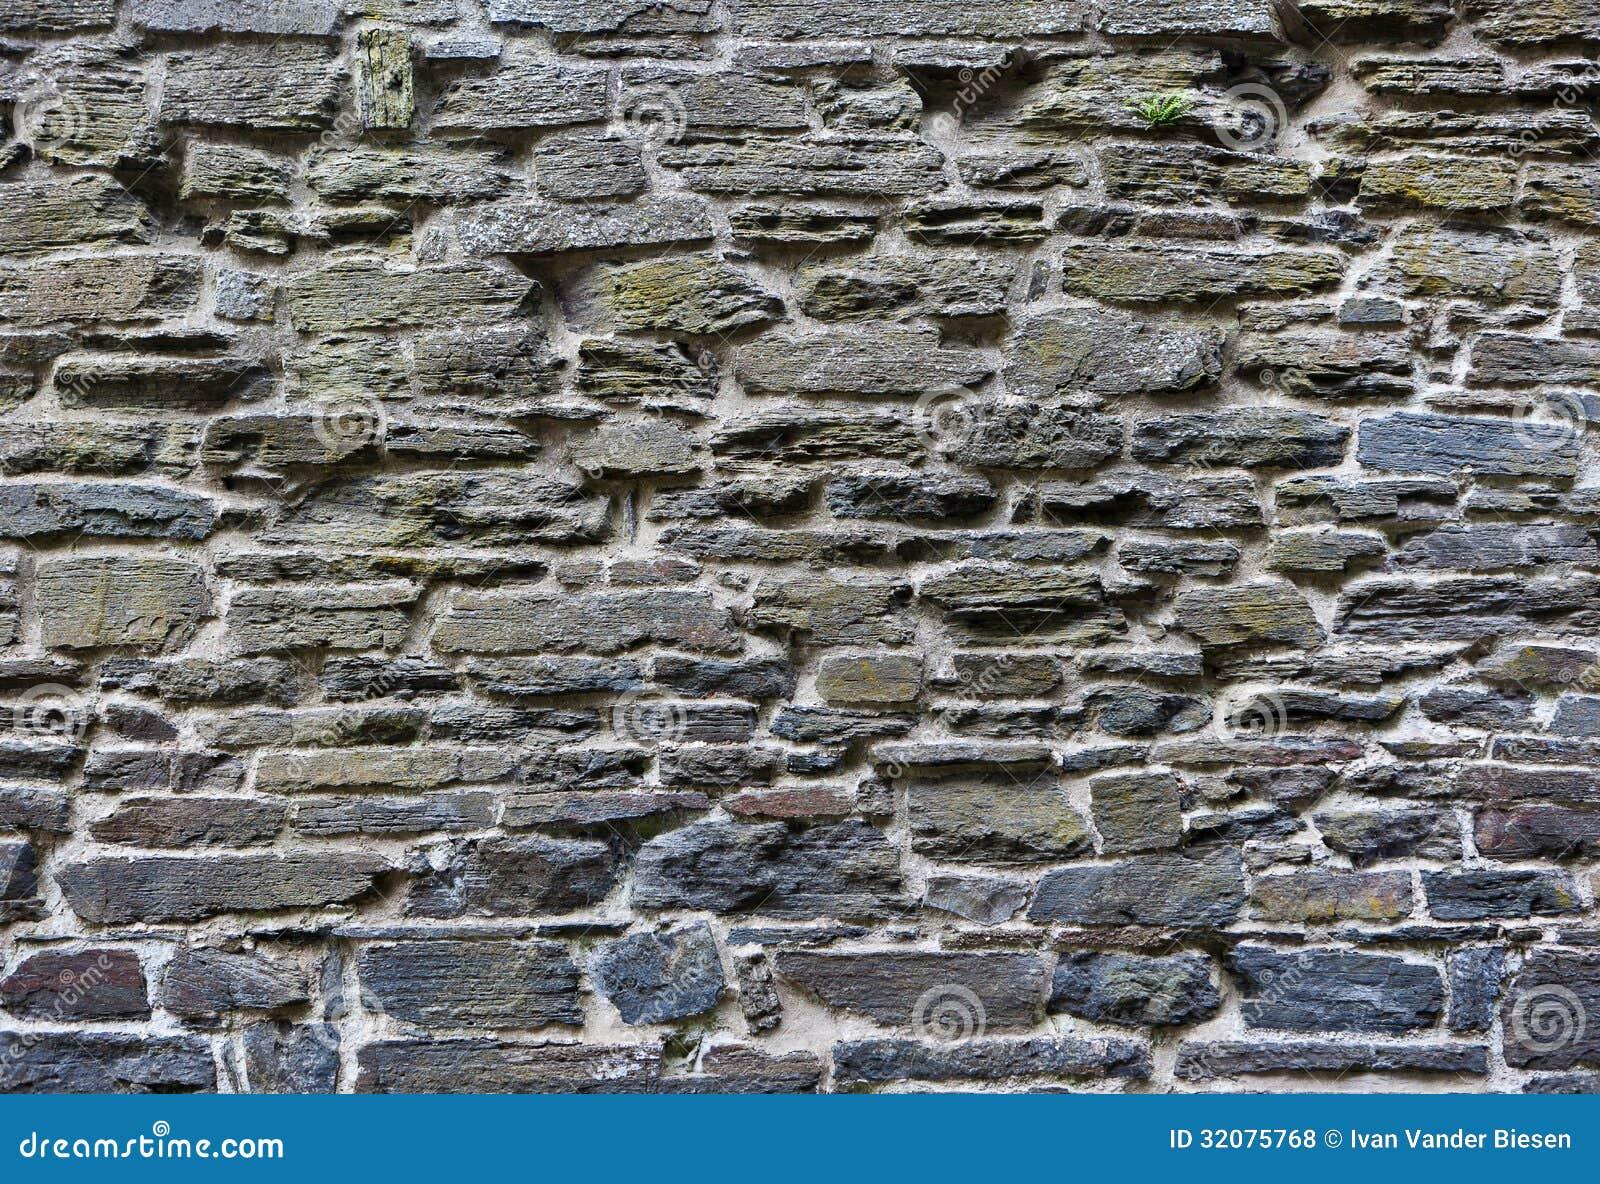 stone natural texture wall dimension royalty built